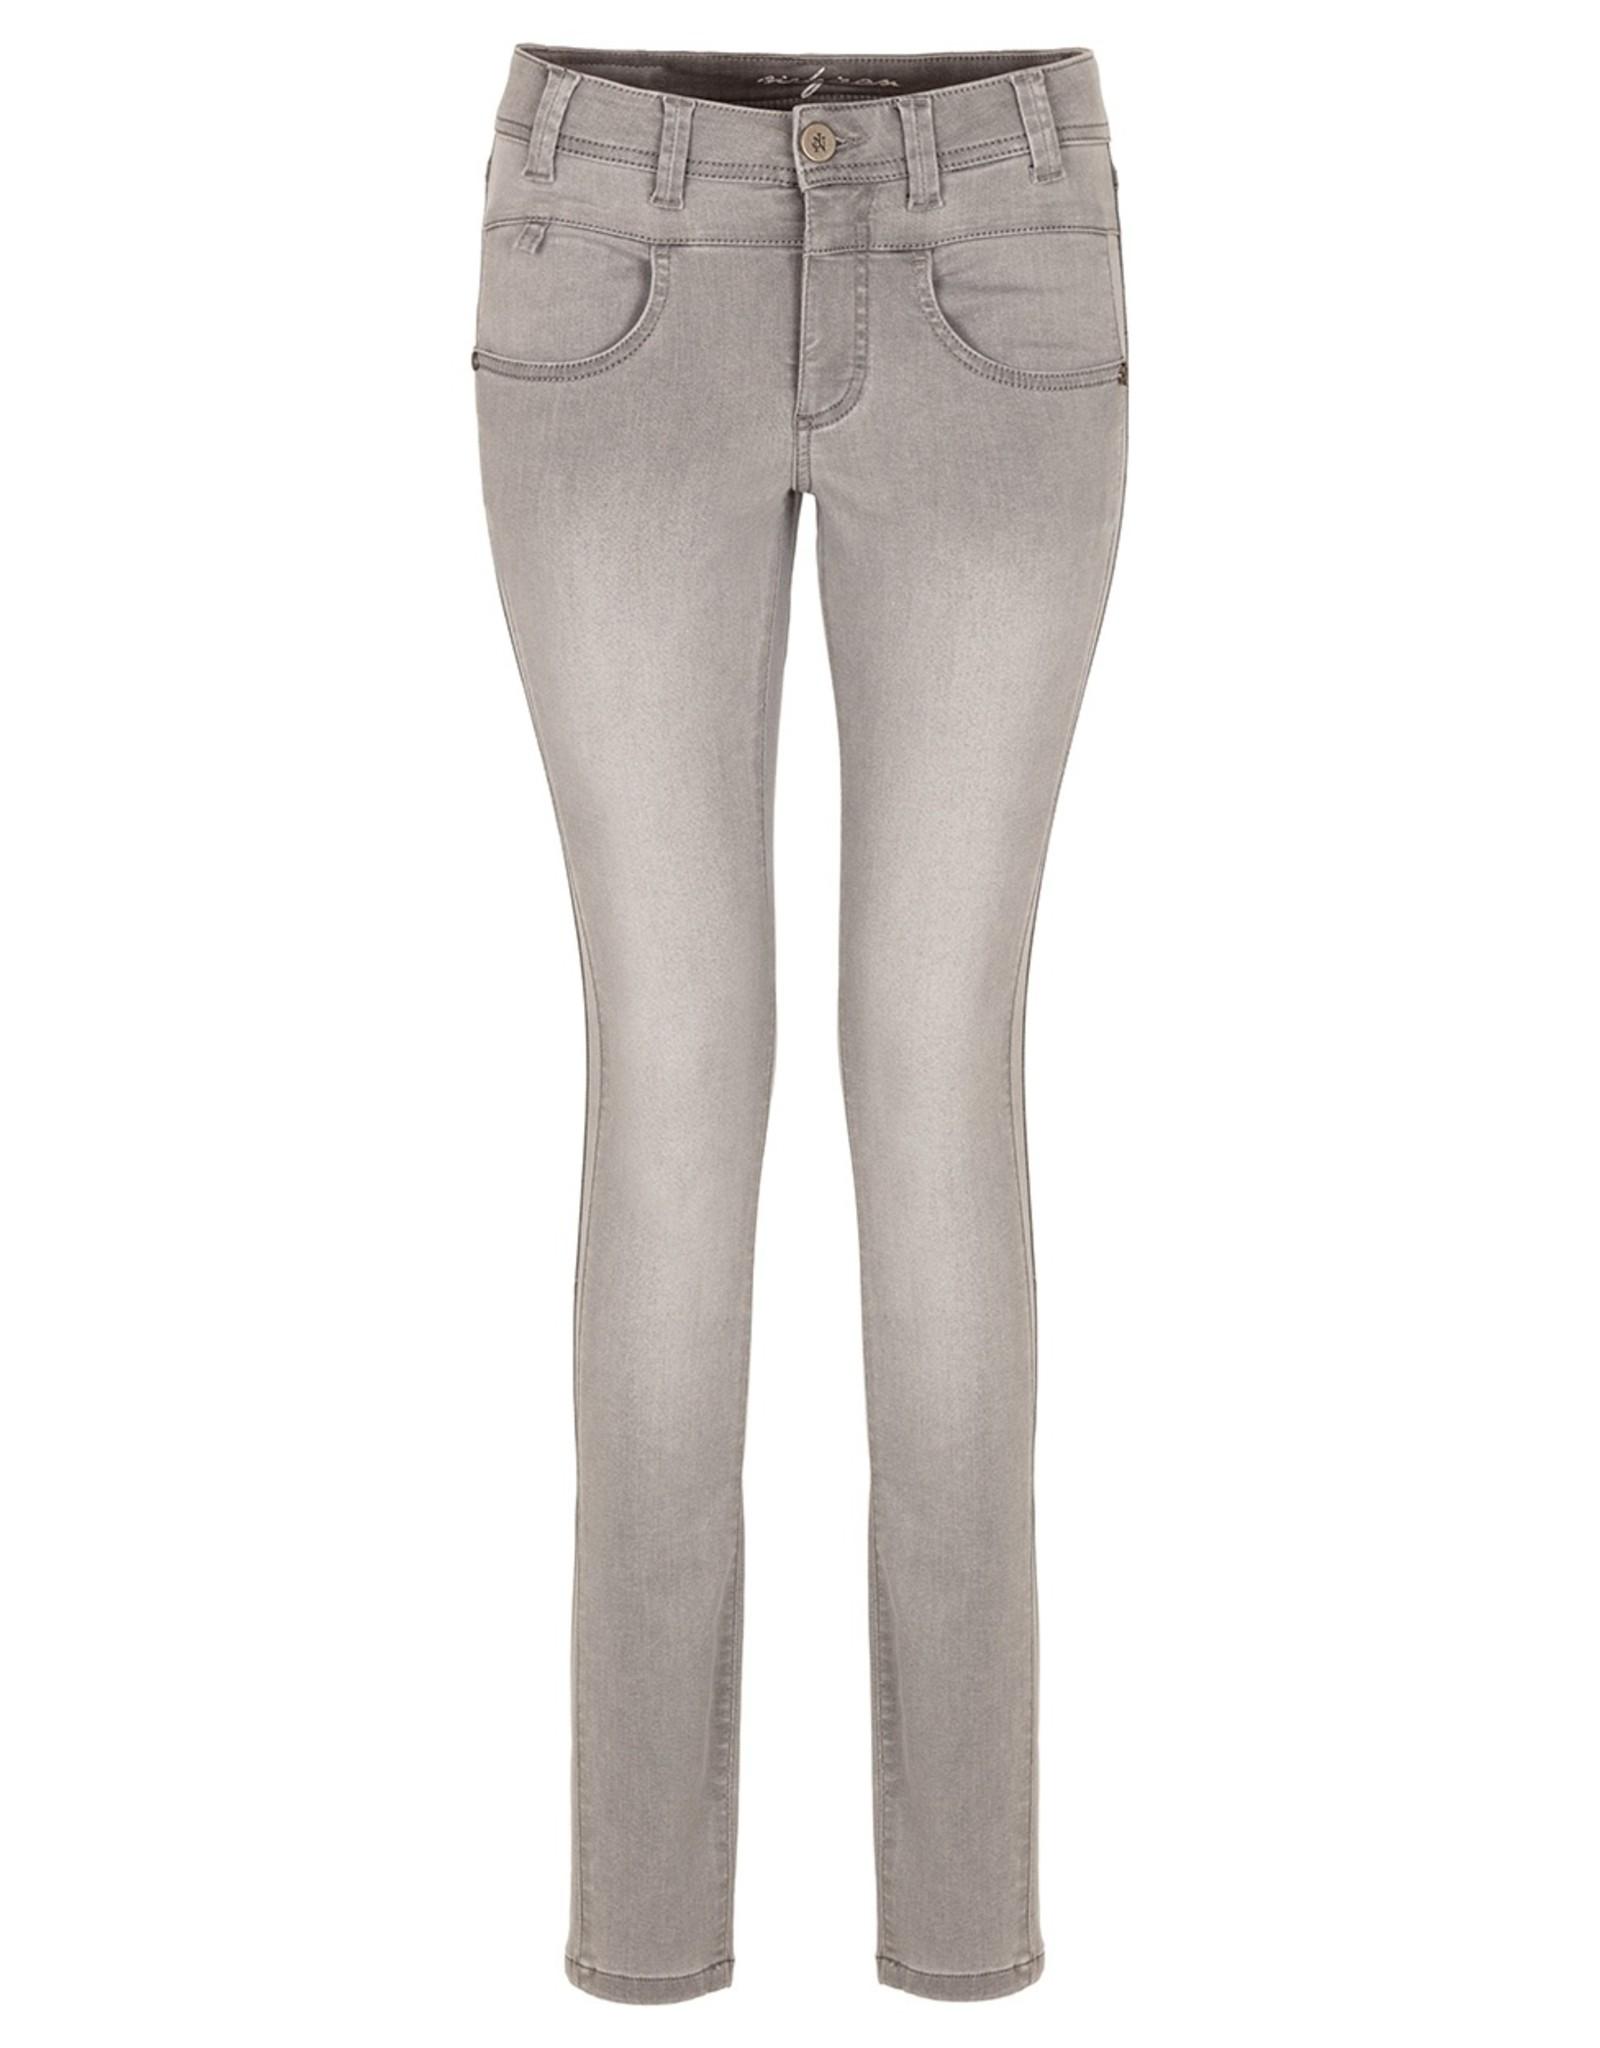 Nickjean Broek Sydney Jeans  grey